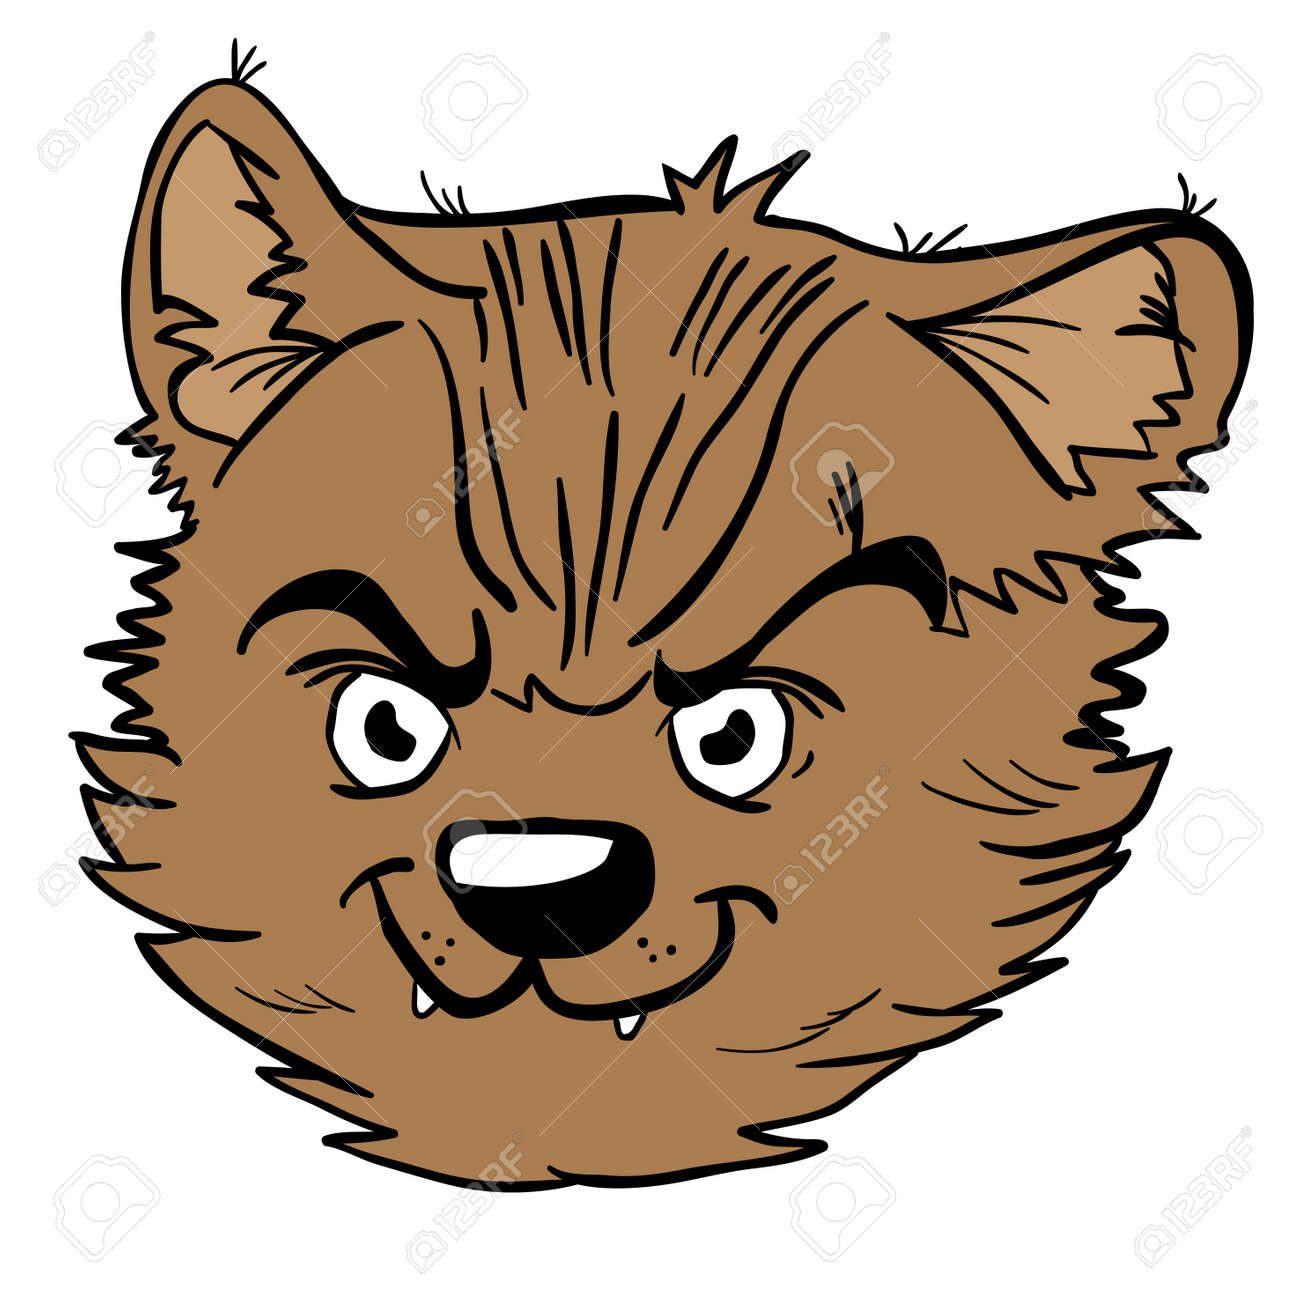 Ilustracao Dos Desenhos Animados De Gato Bravo Isolada No Branco